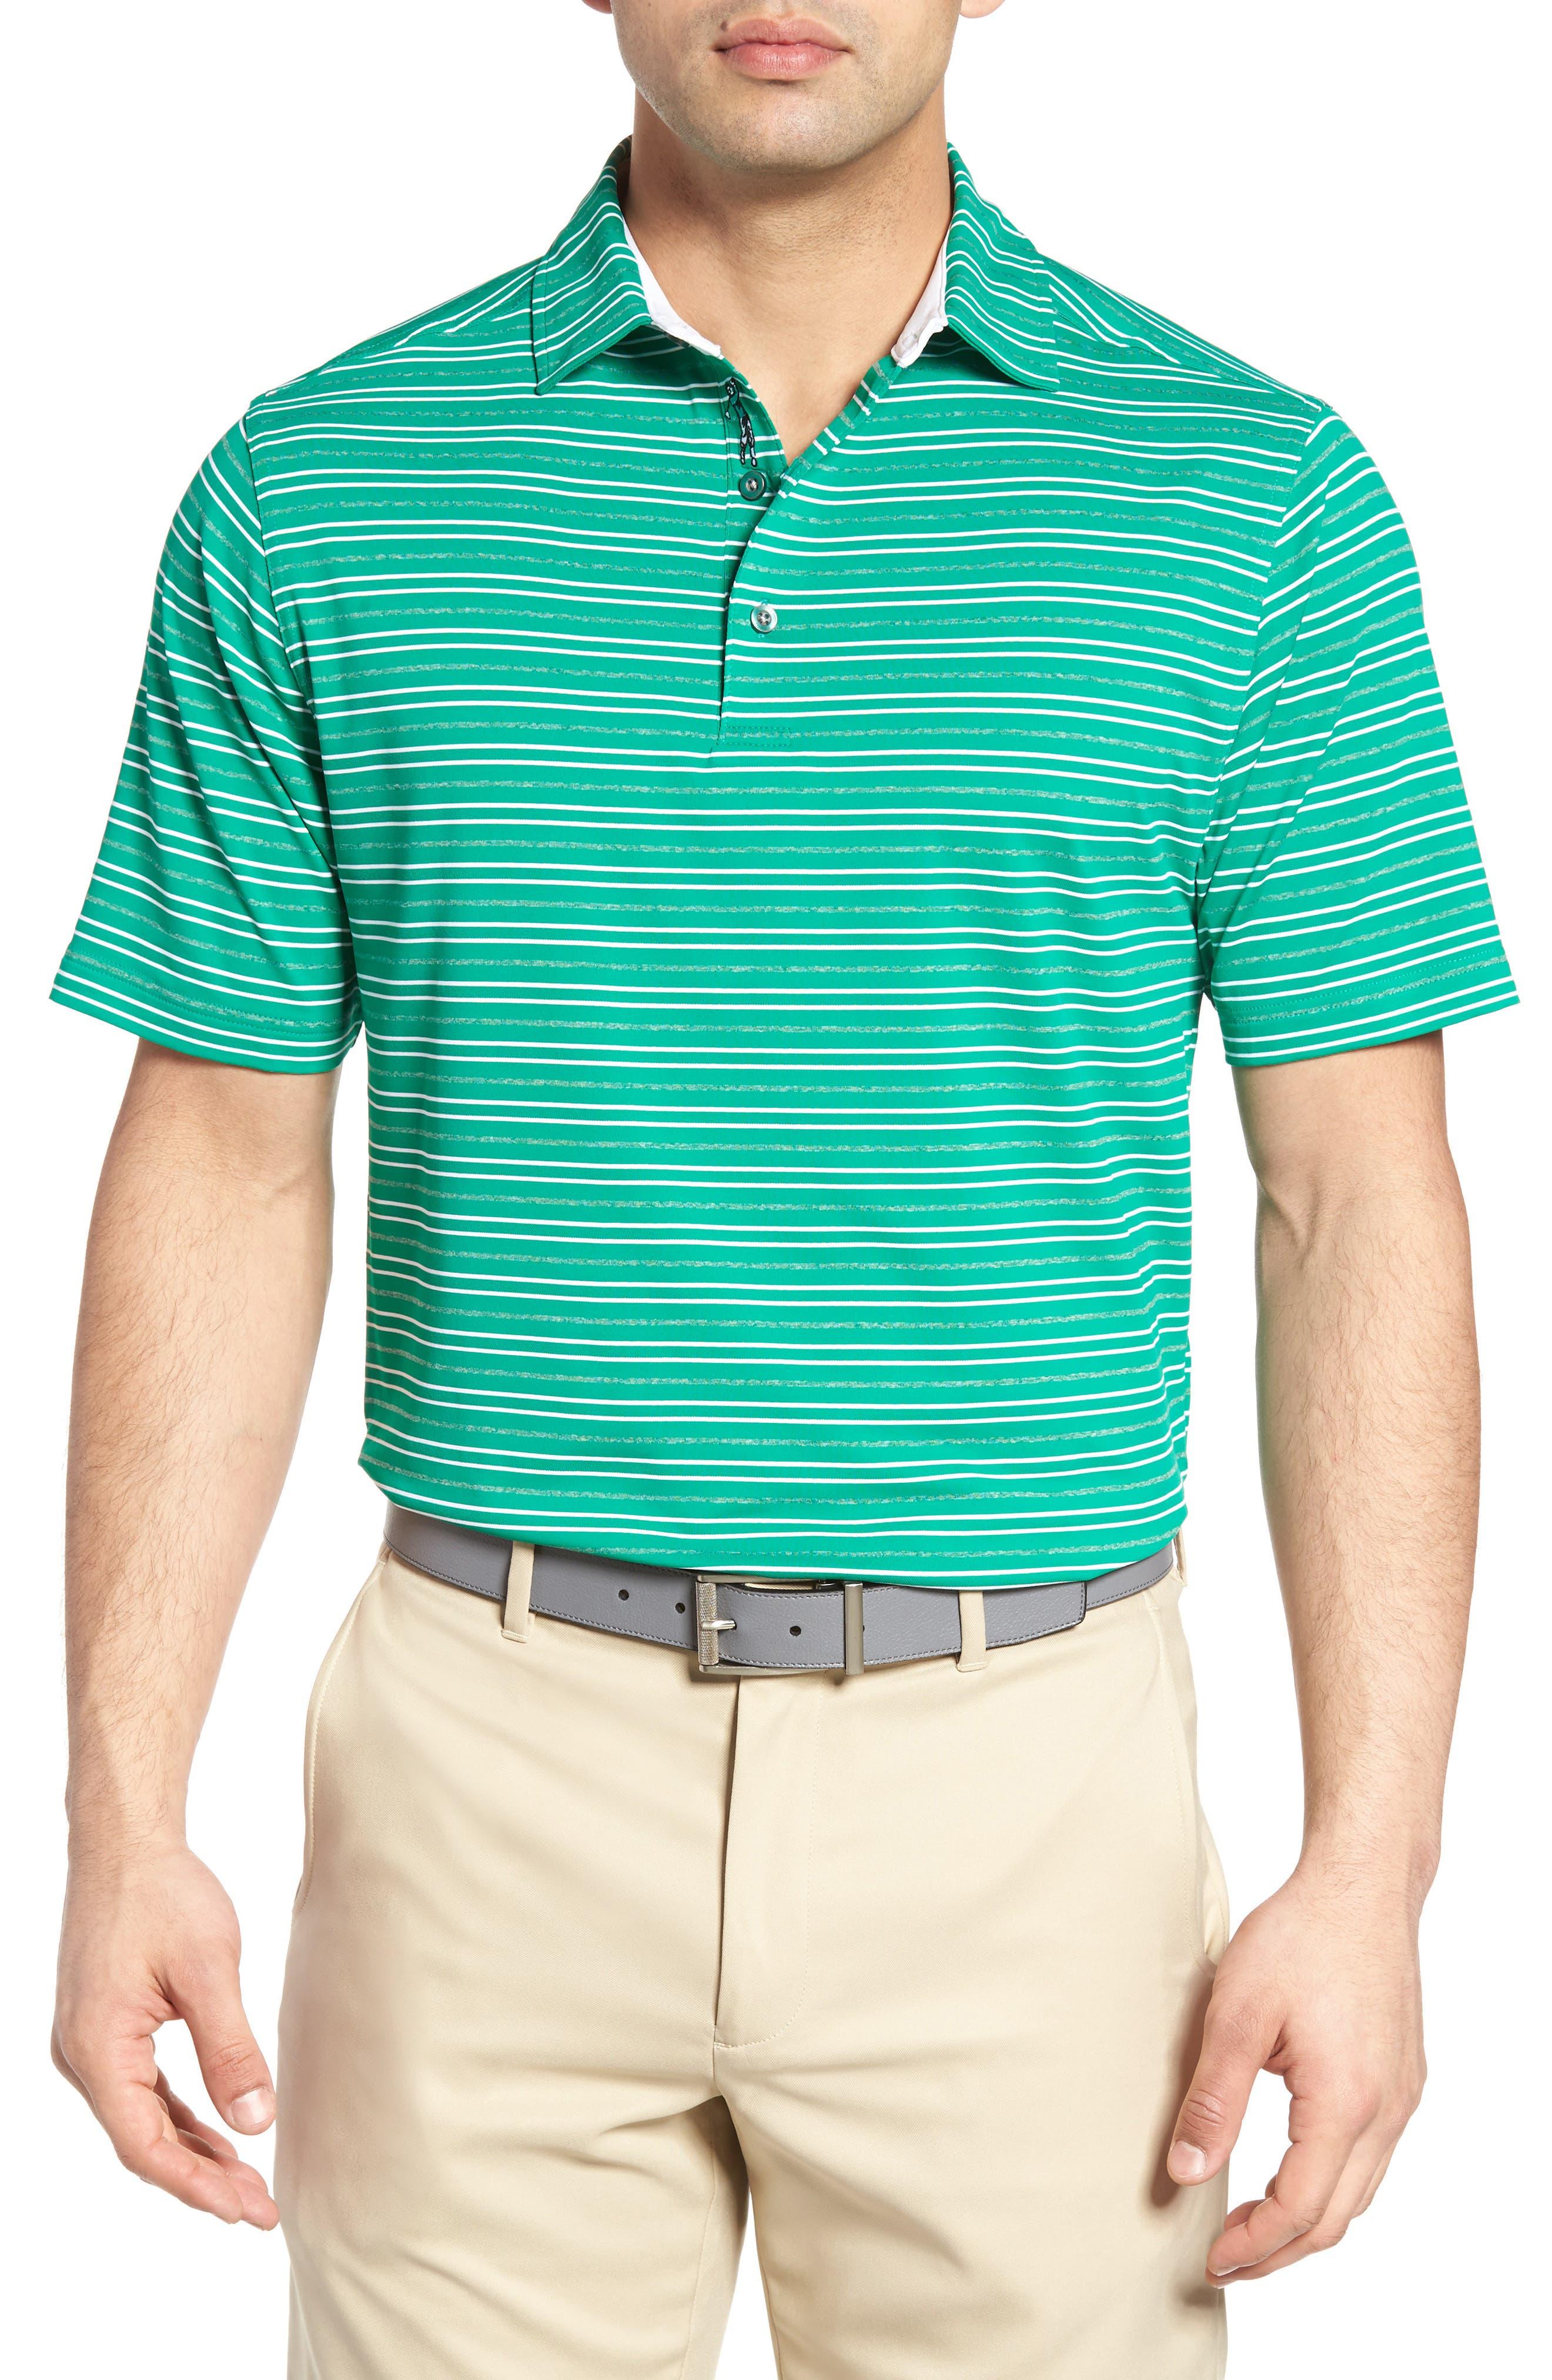 Bobby Jones XH20 Barley Stripe Stretch Golf Polo